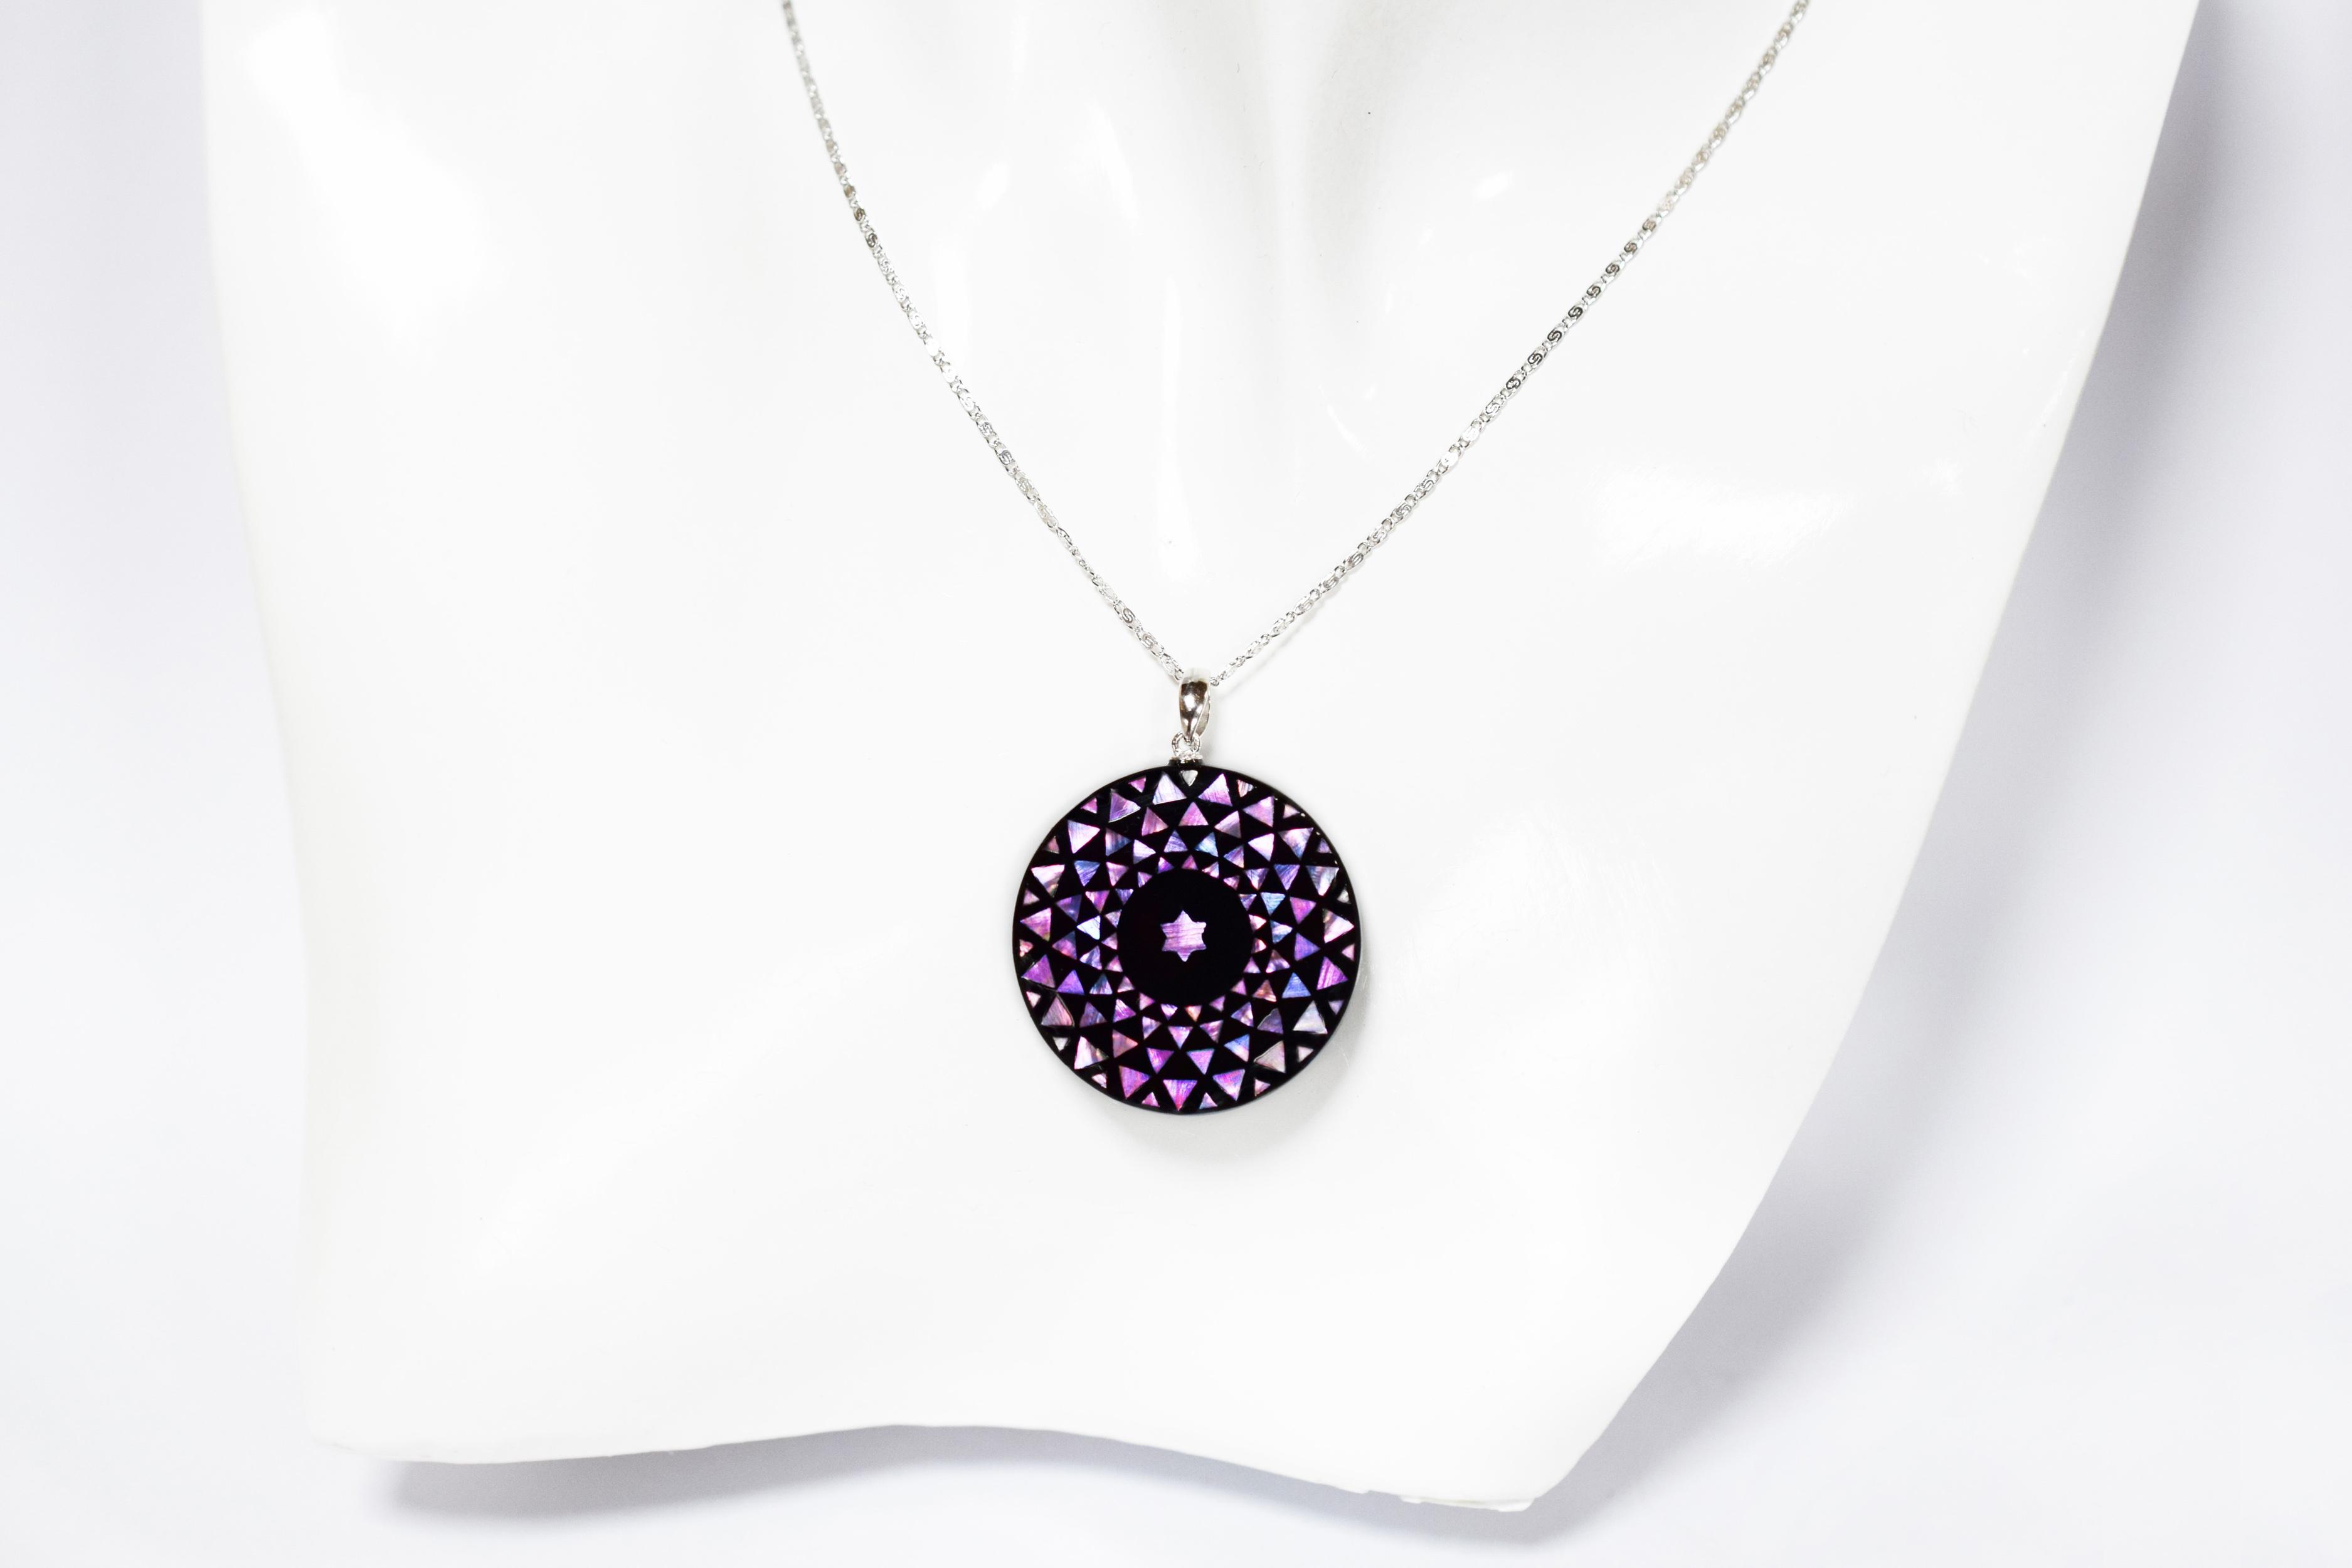 raden_necklace_kikagaku_m_pnk